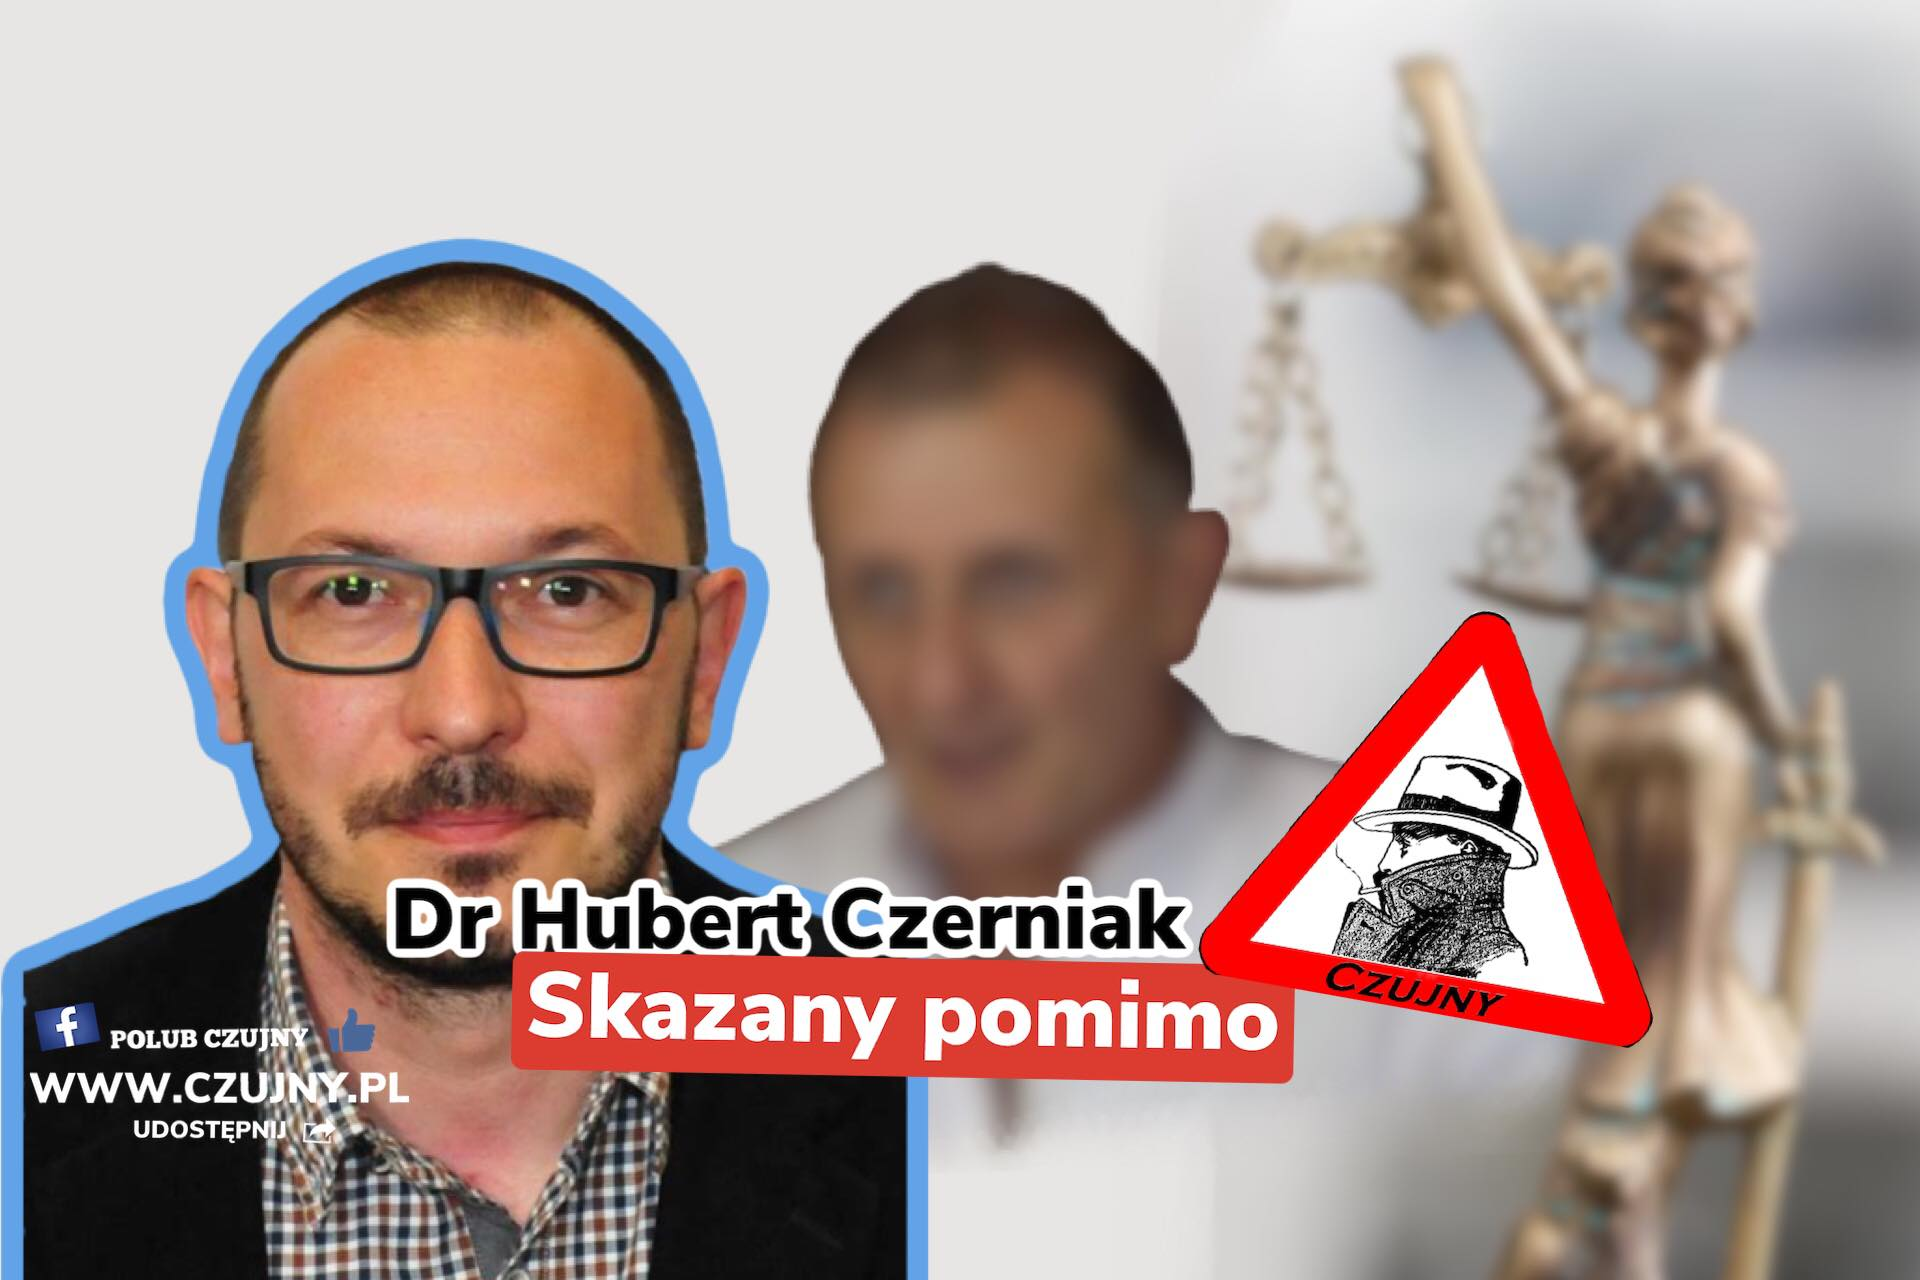 Hubert Czerniak skazany – Paweł Skutecki